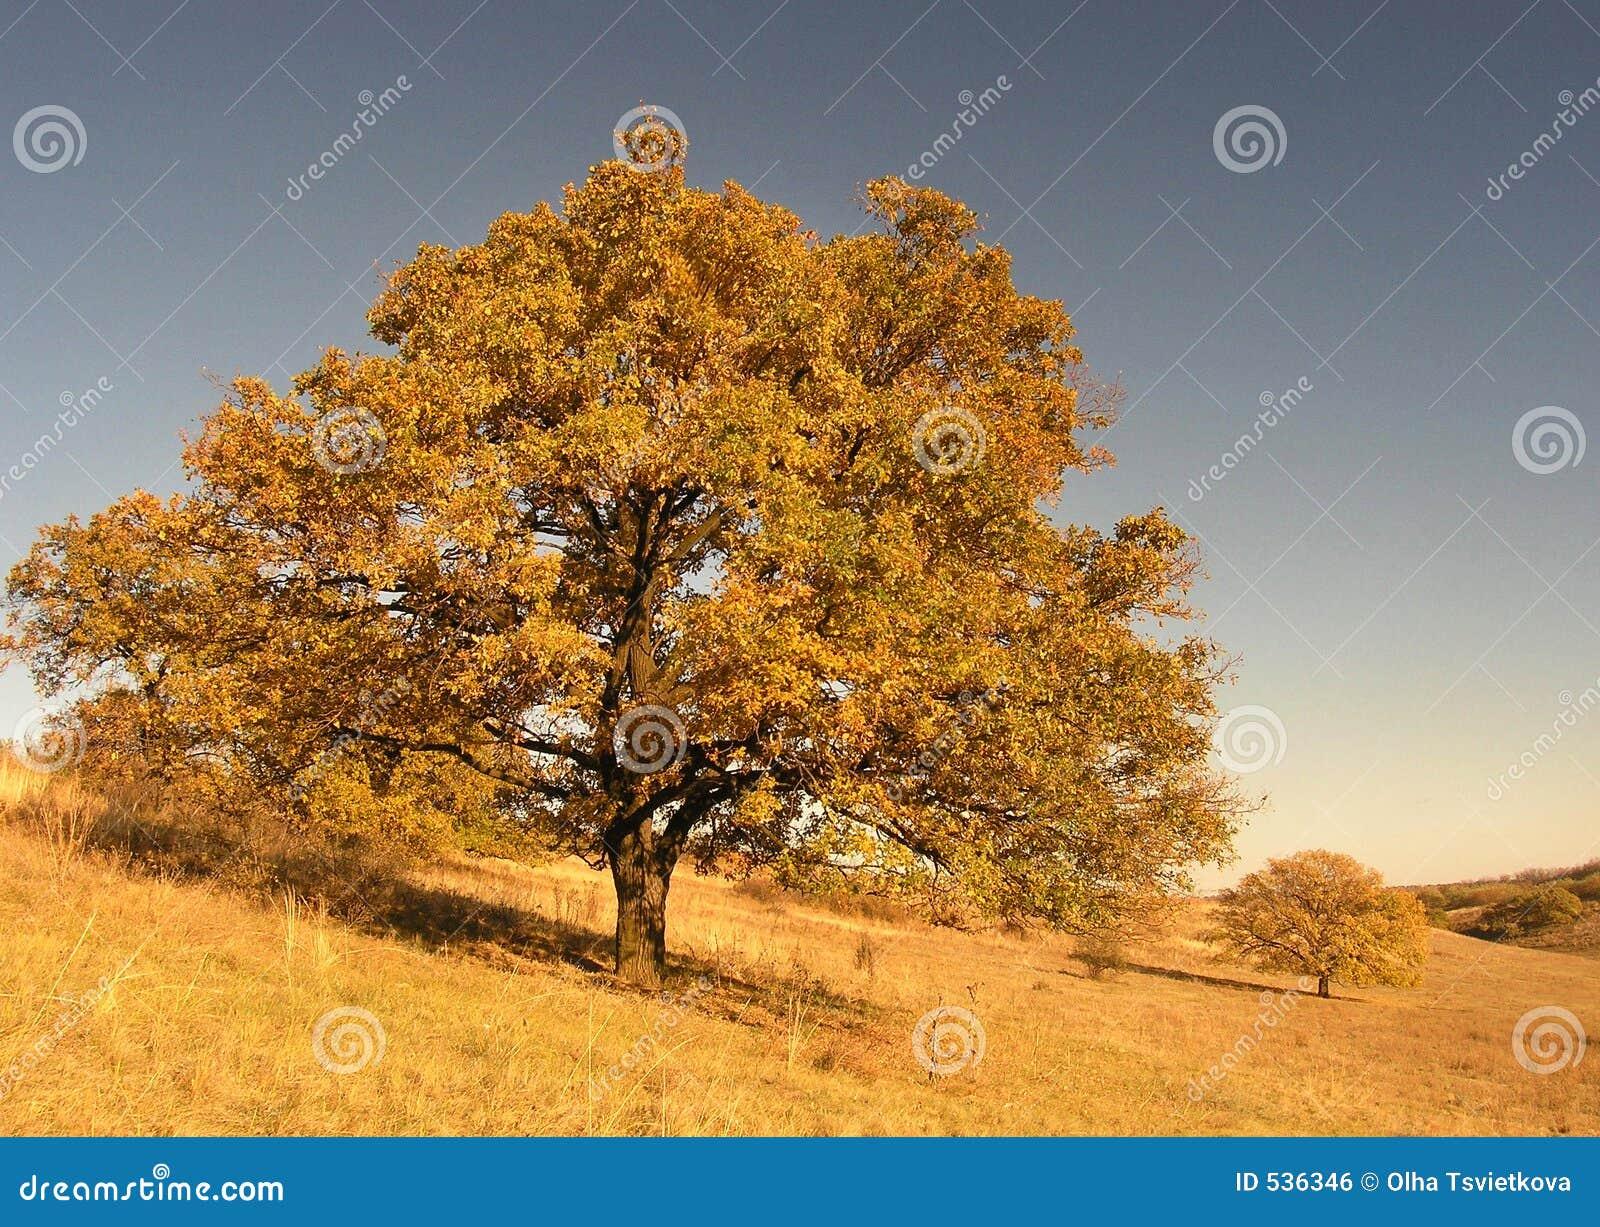 Download 秋天横向结构树 库存照片. 图片 包括有 橡木, 其它, 地球, 节假日, 森林, 工厂, 盖子, 幸福, 玻色子 - 536346